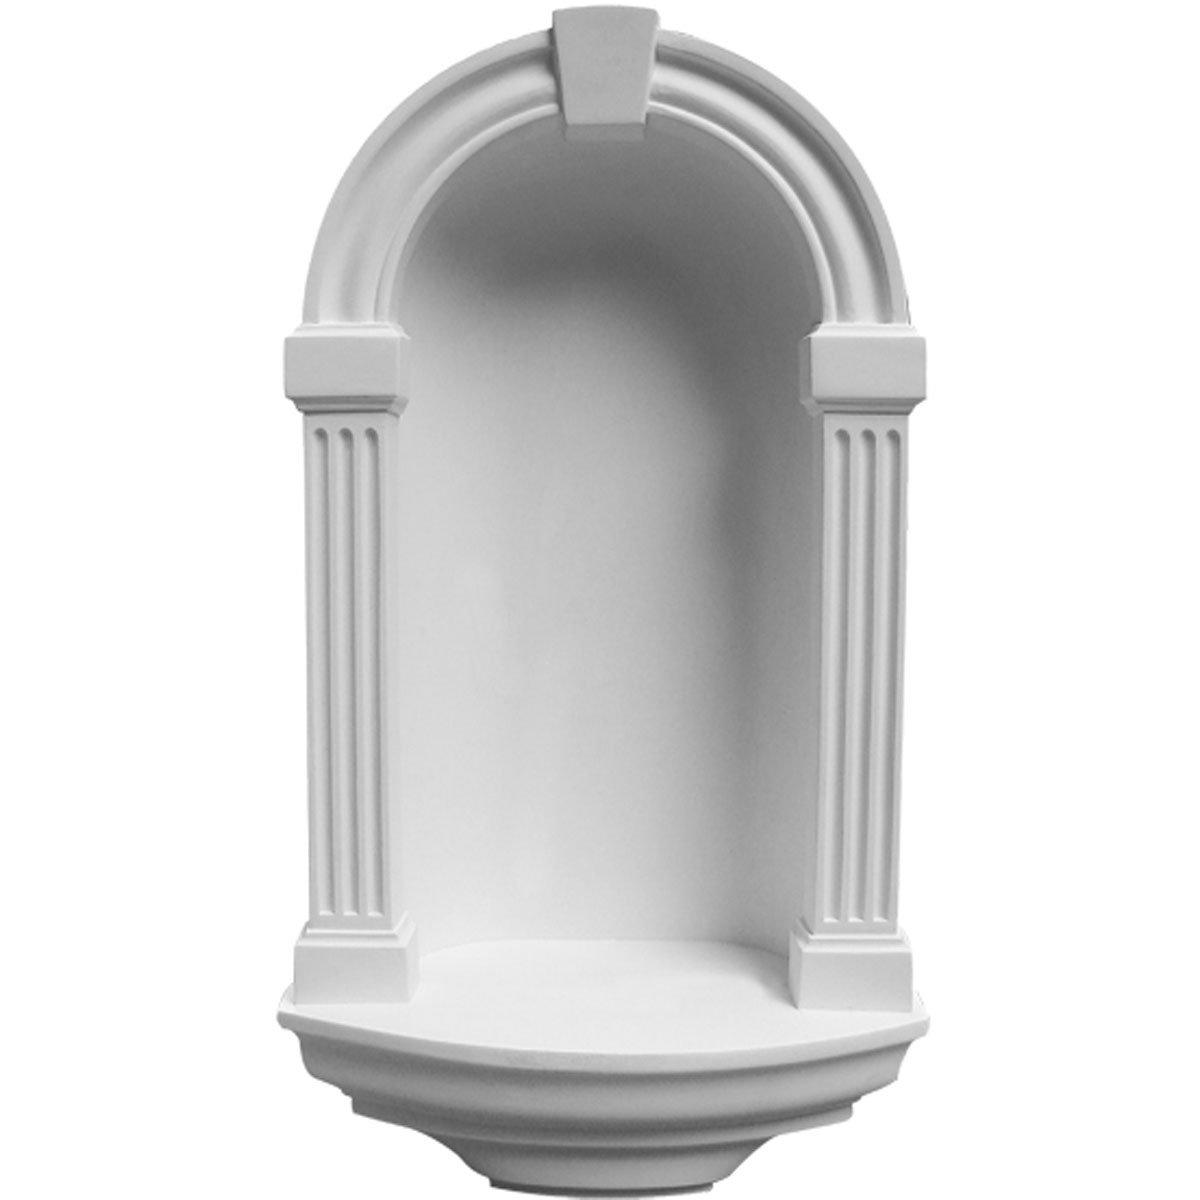 Ekena Millwork NCH16X30AL Wall Niche, Factory Primed White by Ekena Millwork